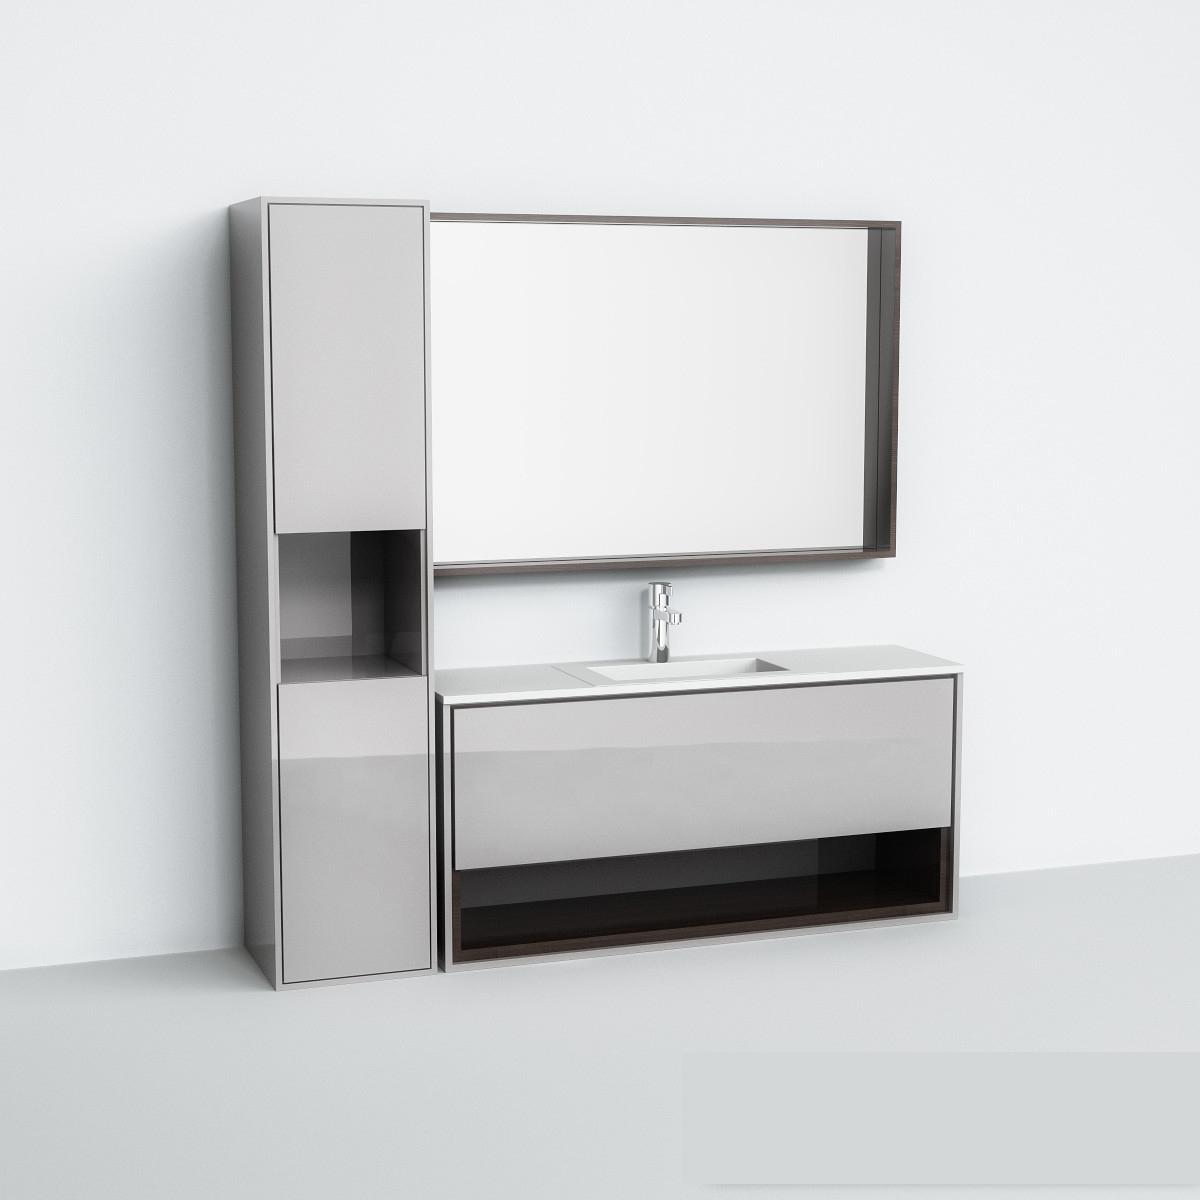 Free Sketchup 3d Model Bathroom Furniture Package 01 Architecture Design Sketchup Dwg